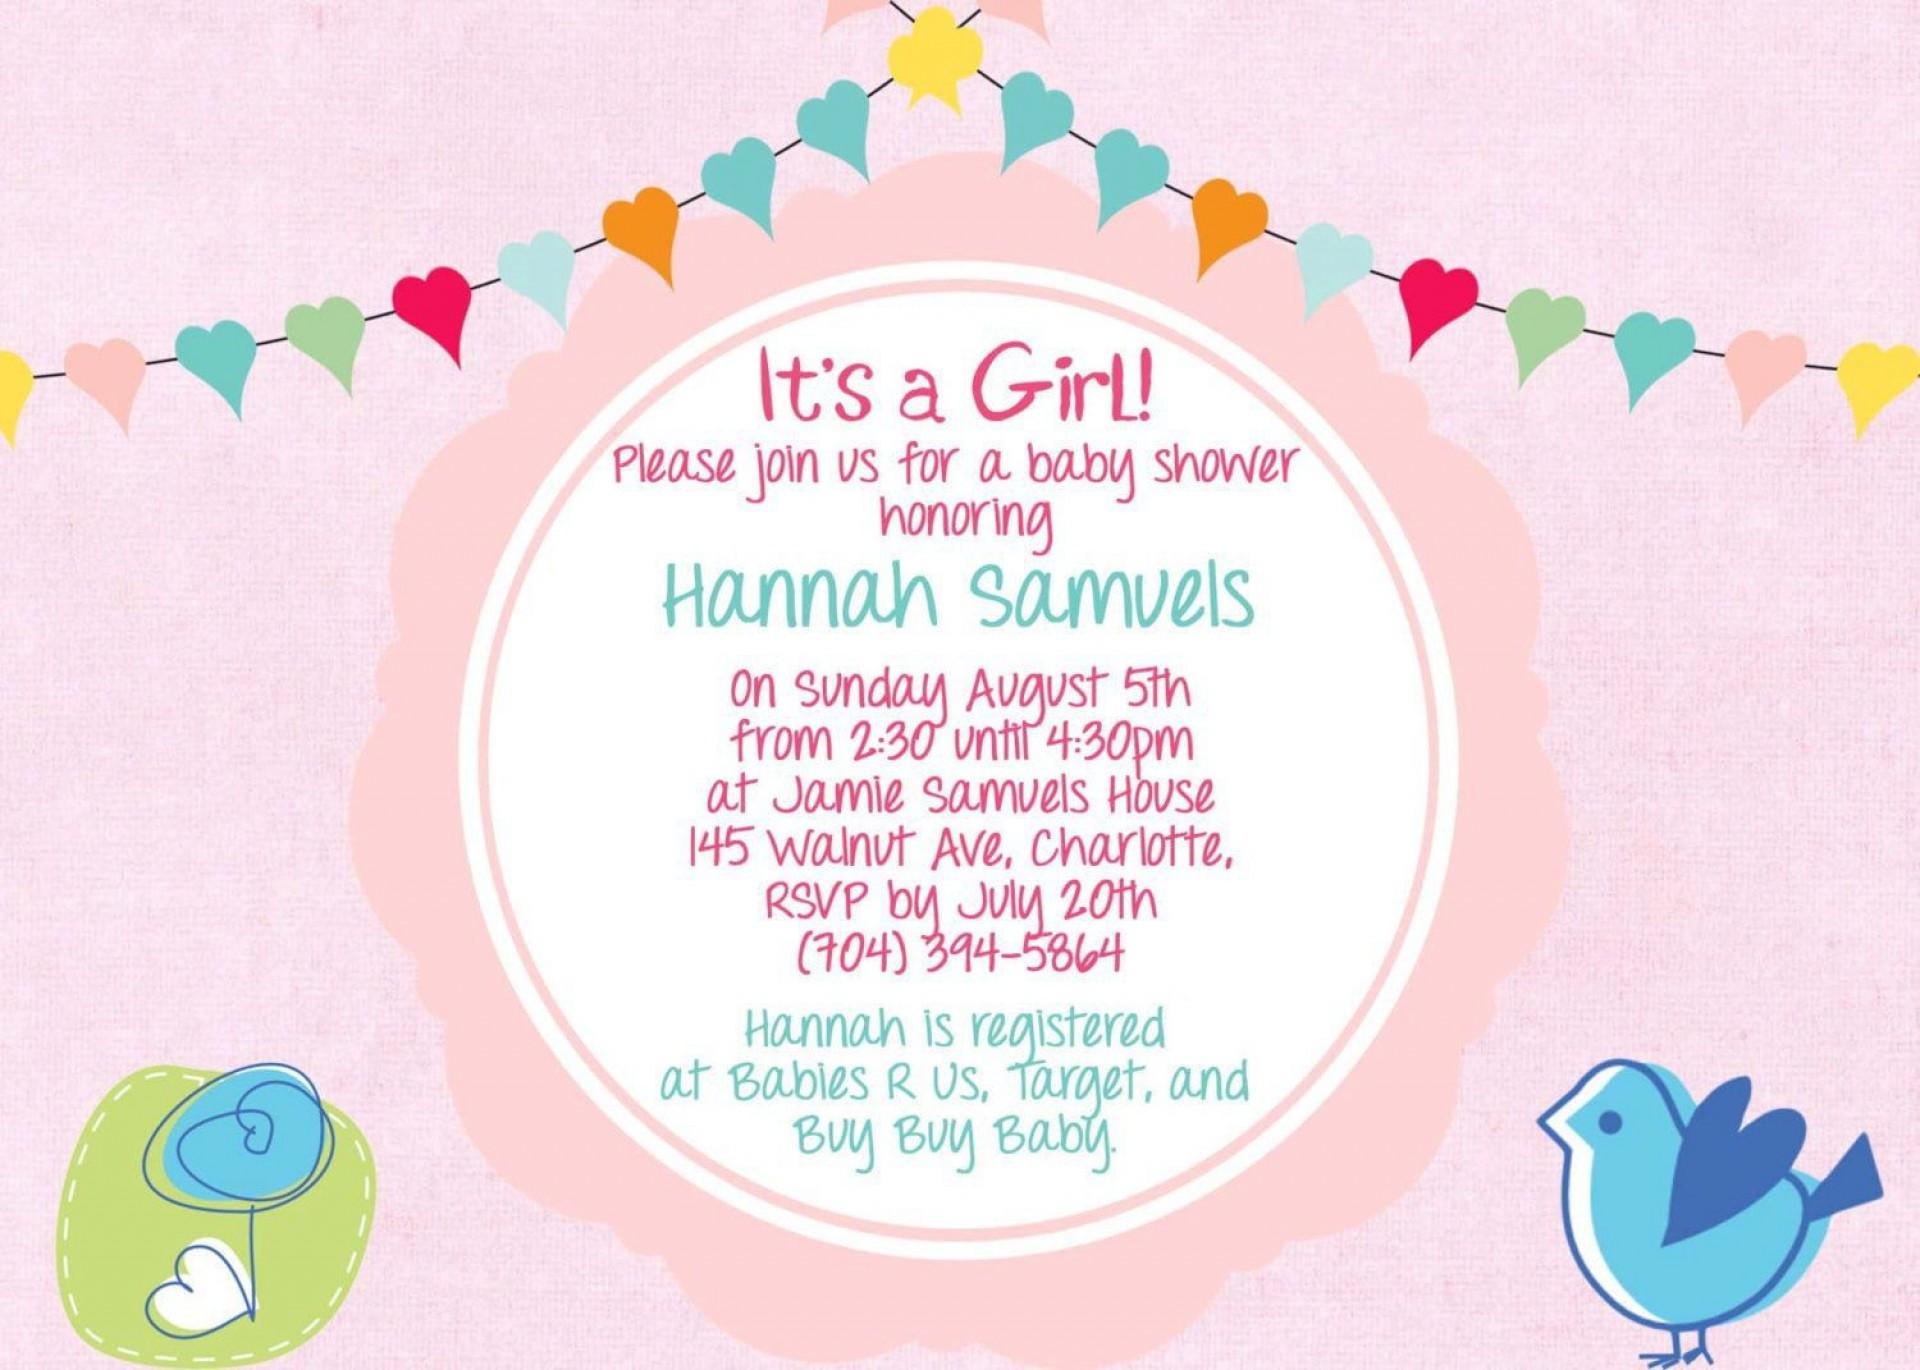 007 Unique Baby Shower Invitation Wording Example Photo  Examples Invite Coed Idea For Boy1920